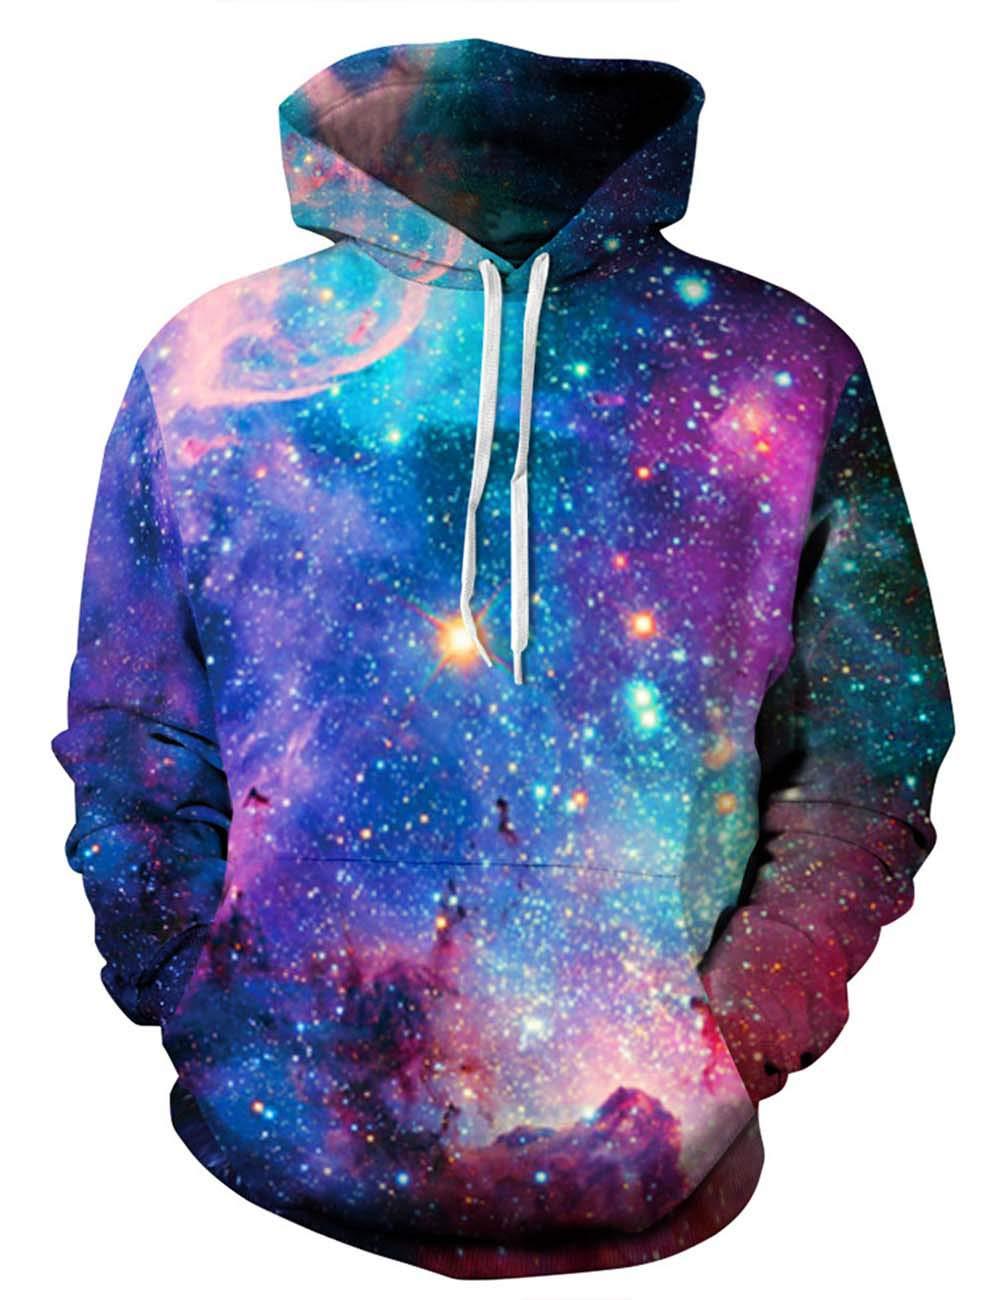 ALISISTER Unisex 3D Galaxy Pullover Hoodie Bunt Bedruckte Kapuze Sweatshirt Langarm Kordelzug Pullover M